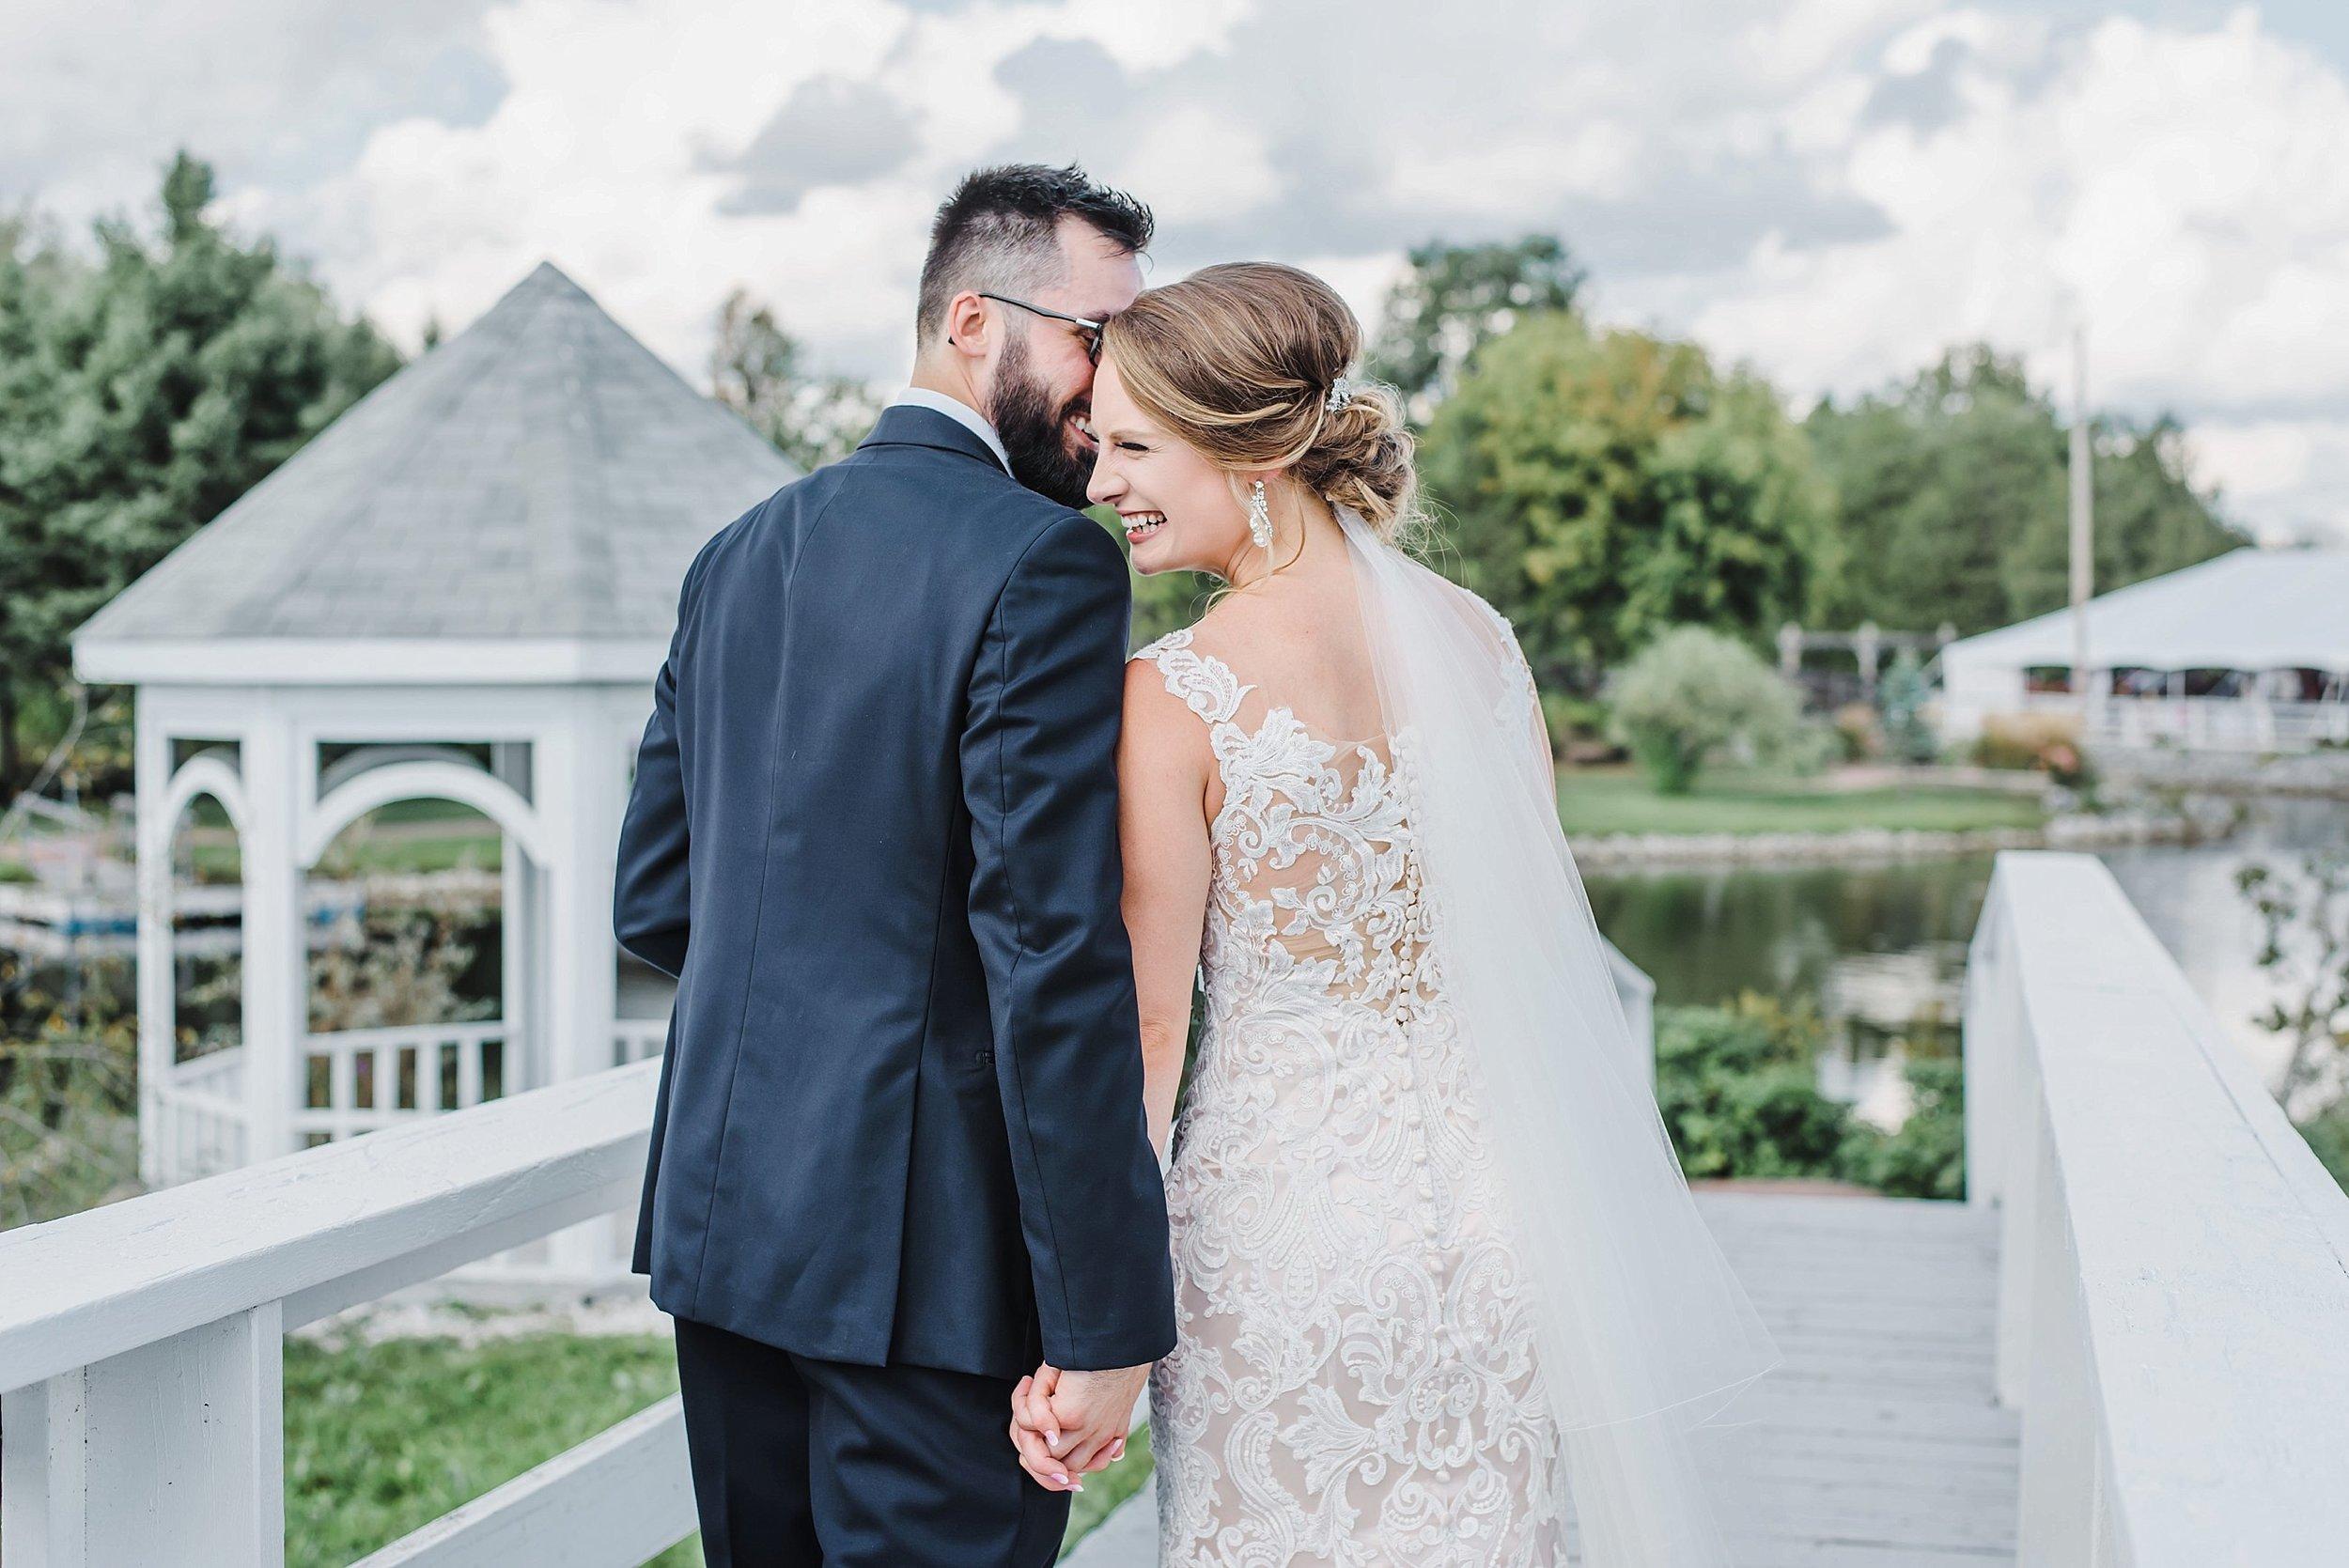 light airy indie fine art ottawa wedding photographer | Ali and Batoul Photography_1291.jpg